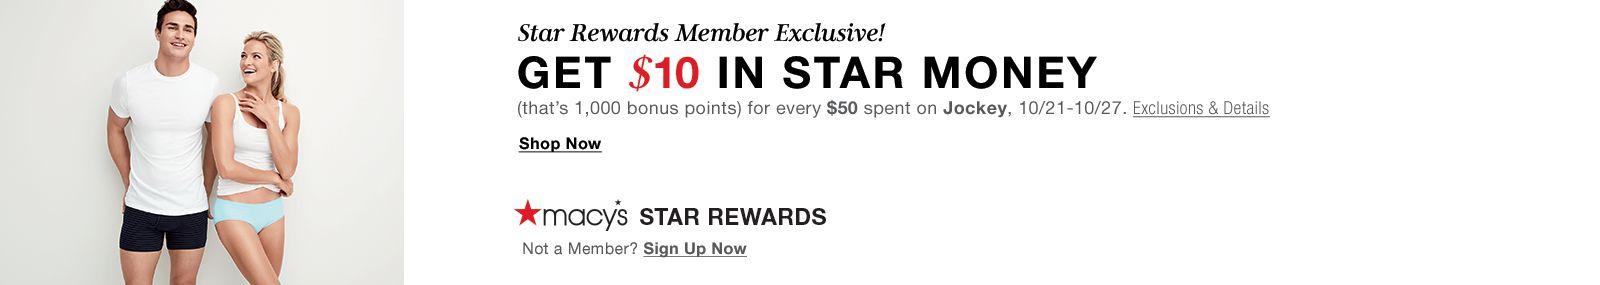 Jockey Star Rewards